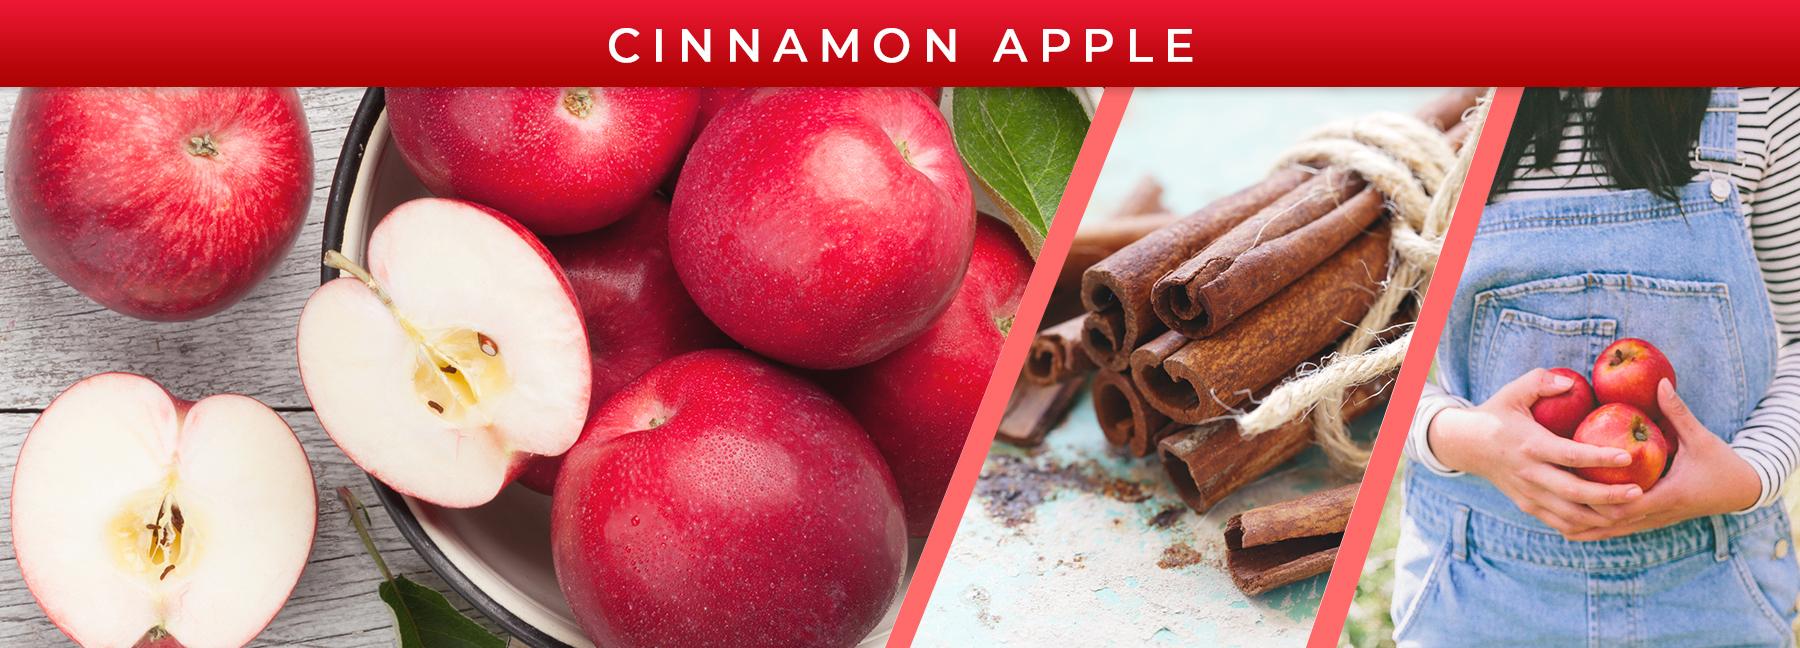 Cinnamon Apple fragrance elements